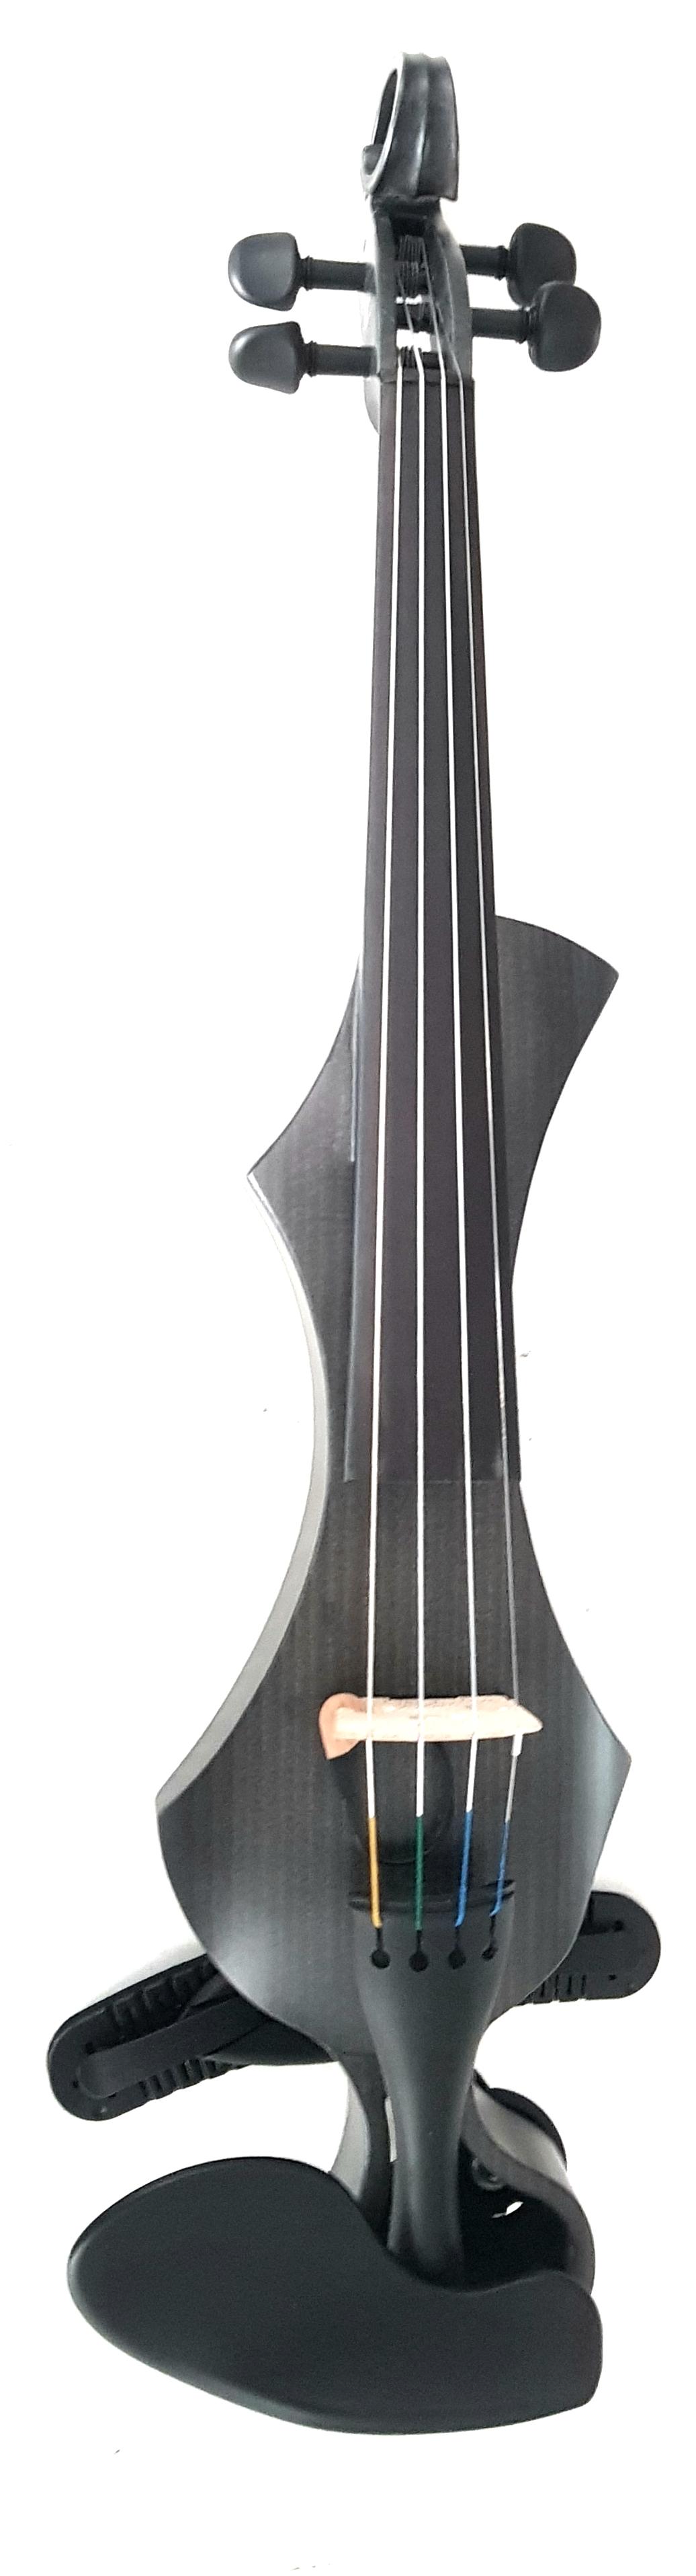 e-geigen - e-violinen - musikhaus hannover